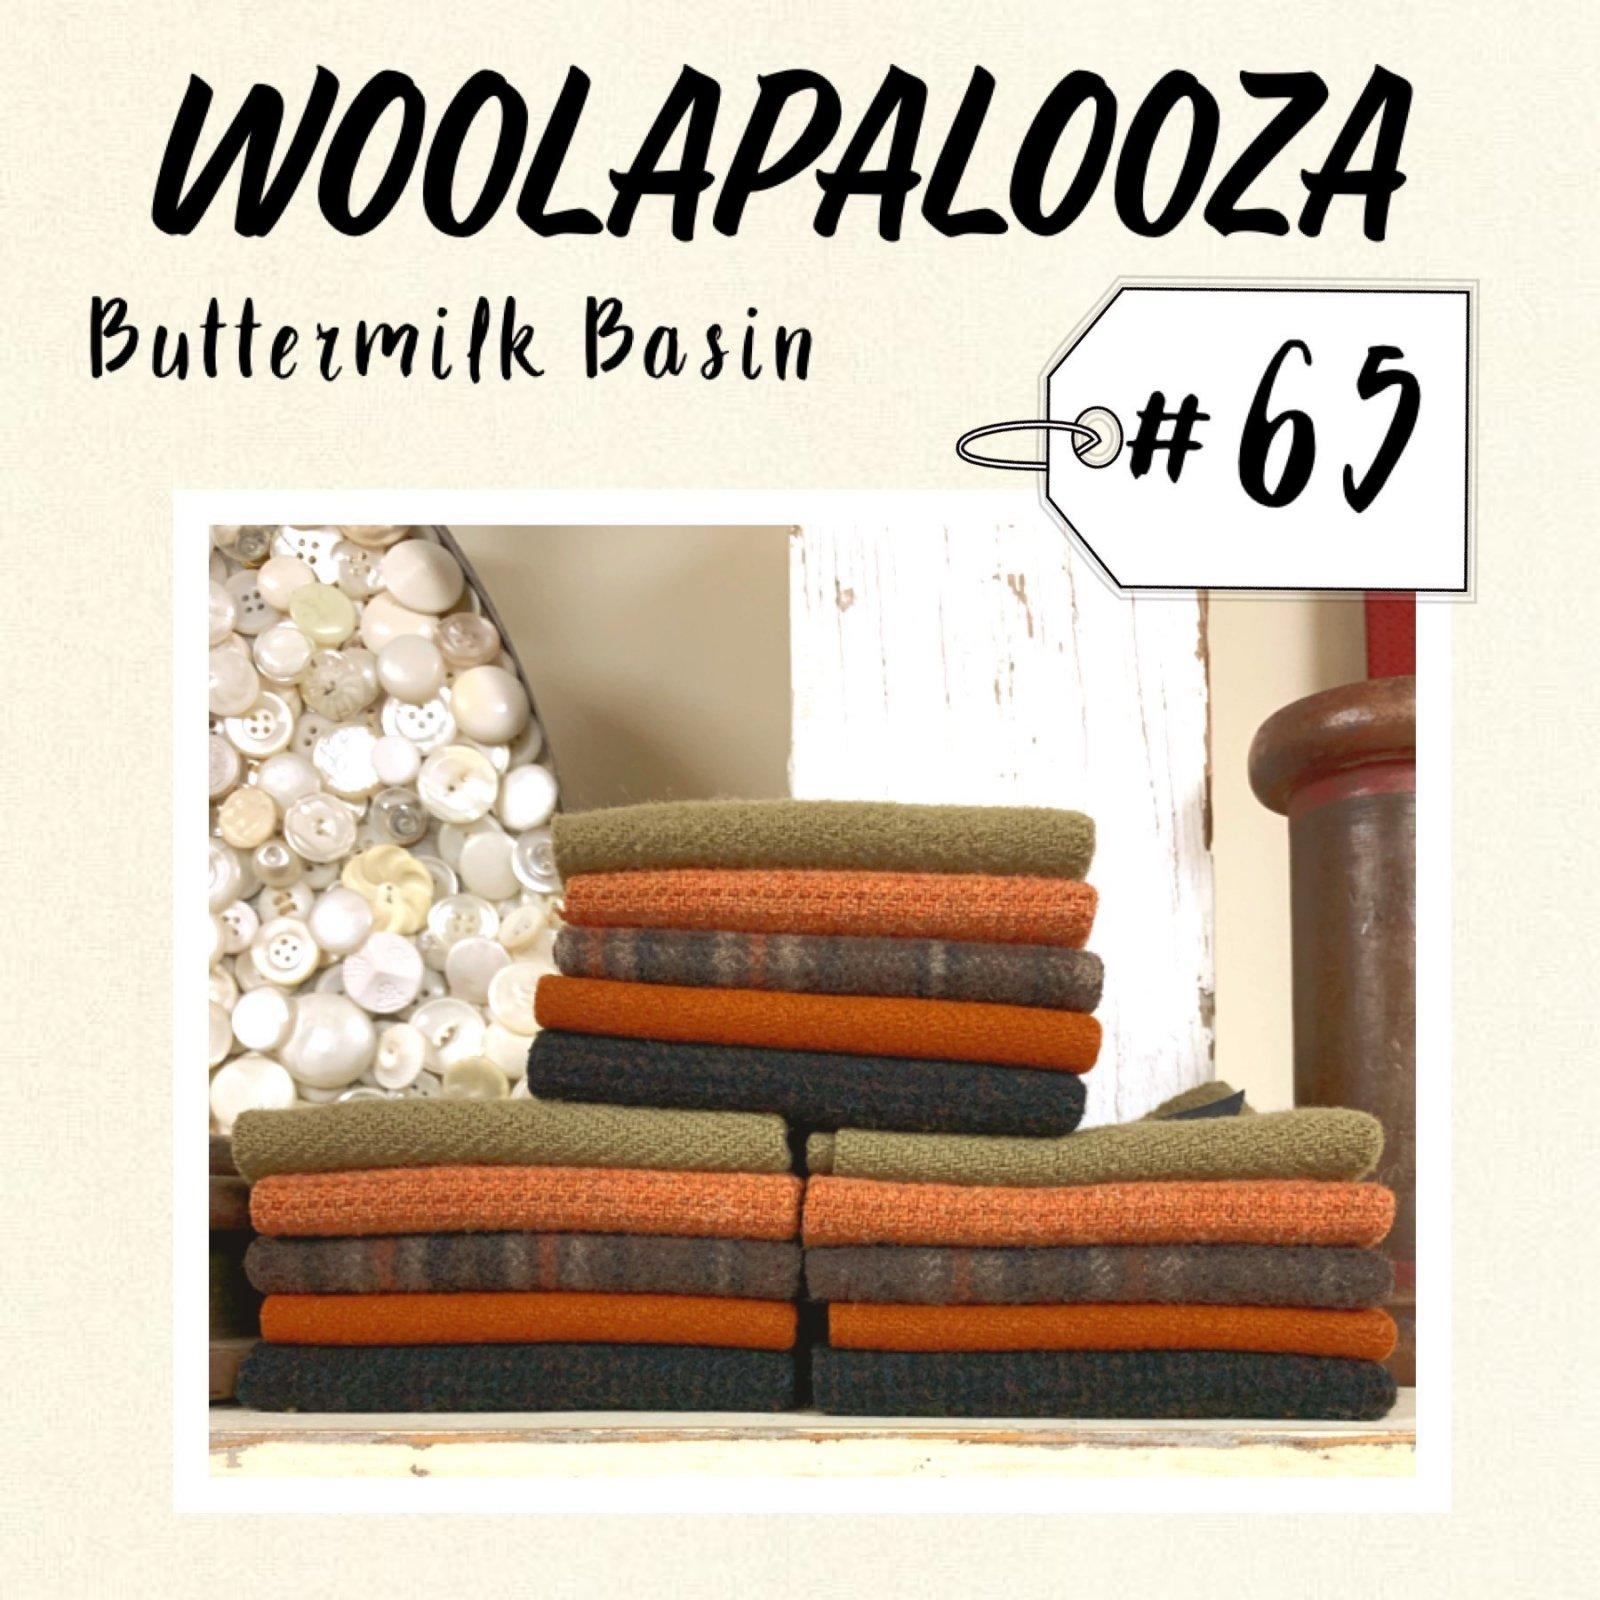 Woolapalooza #65 Wool Bundle